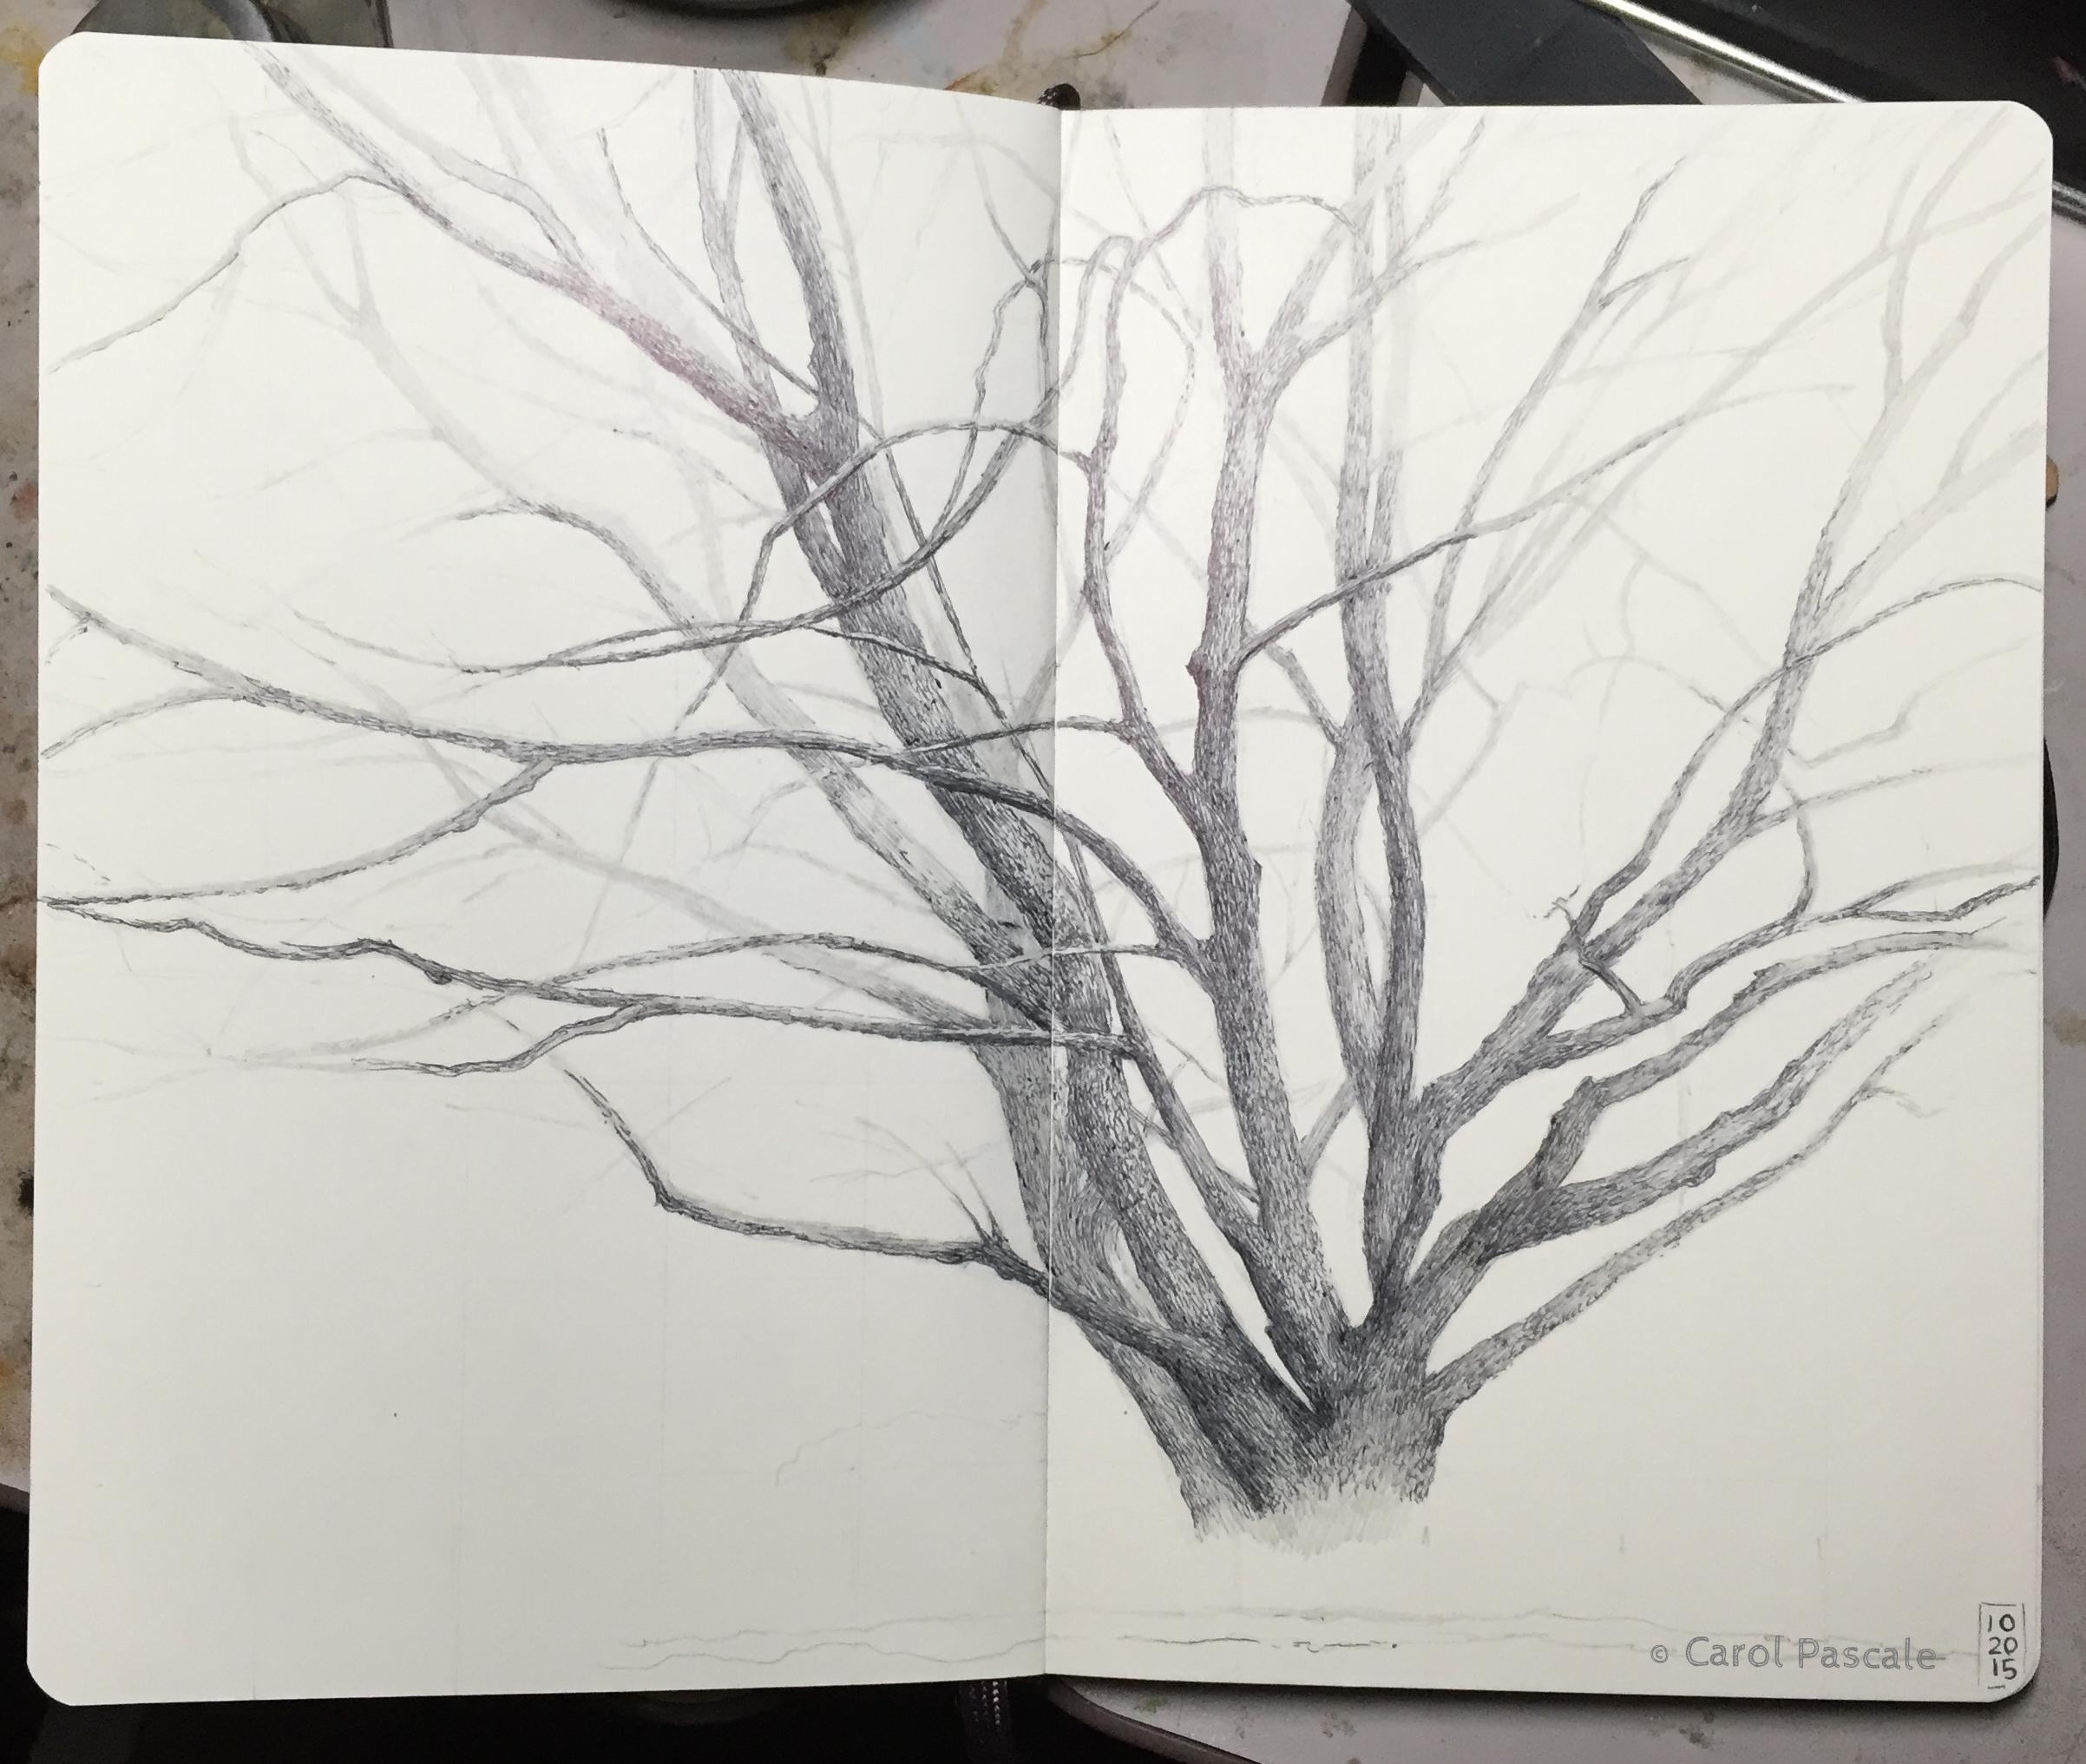 Ballpoint pen drawing of a maple tree in winter